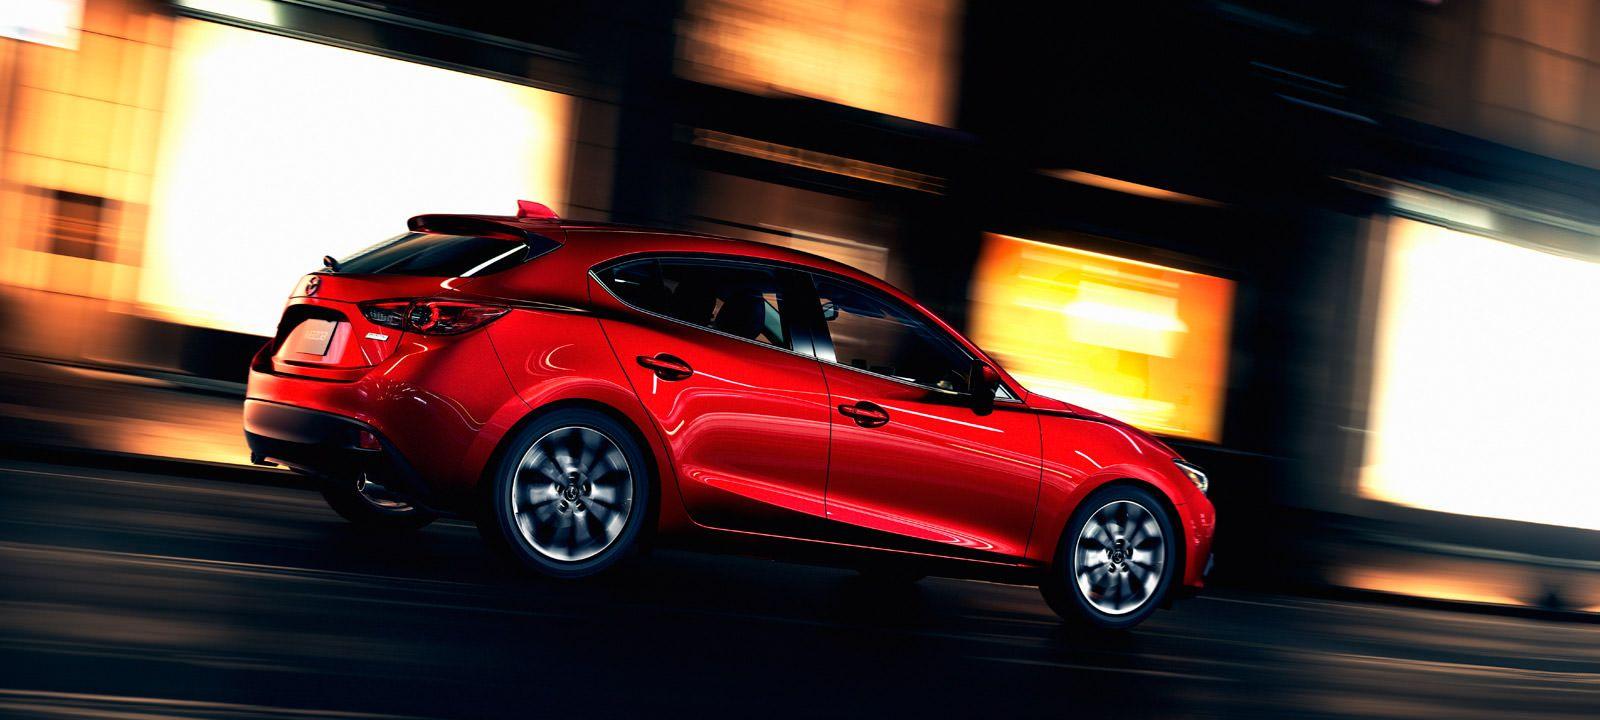 2015 Mazda 3 hatchback Mazda 3 hatchback, Mazda, Hatchback